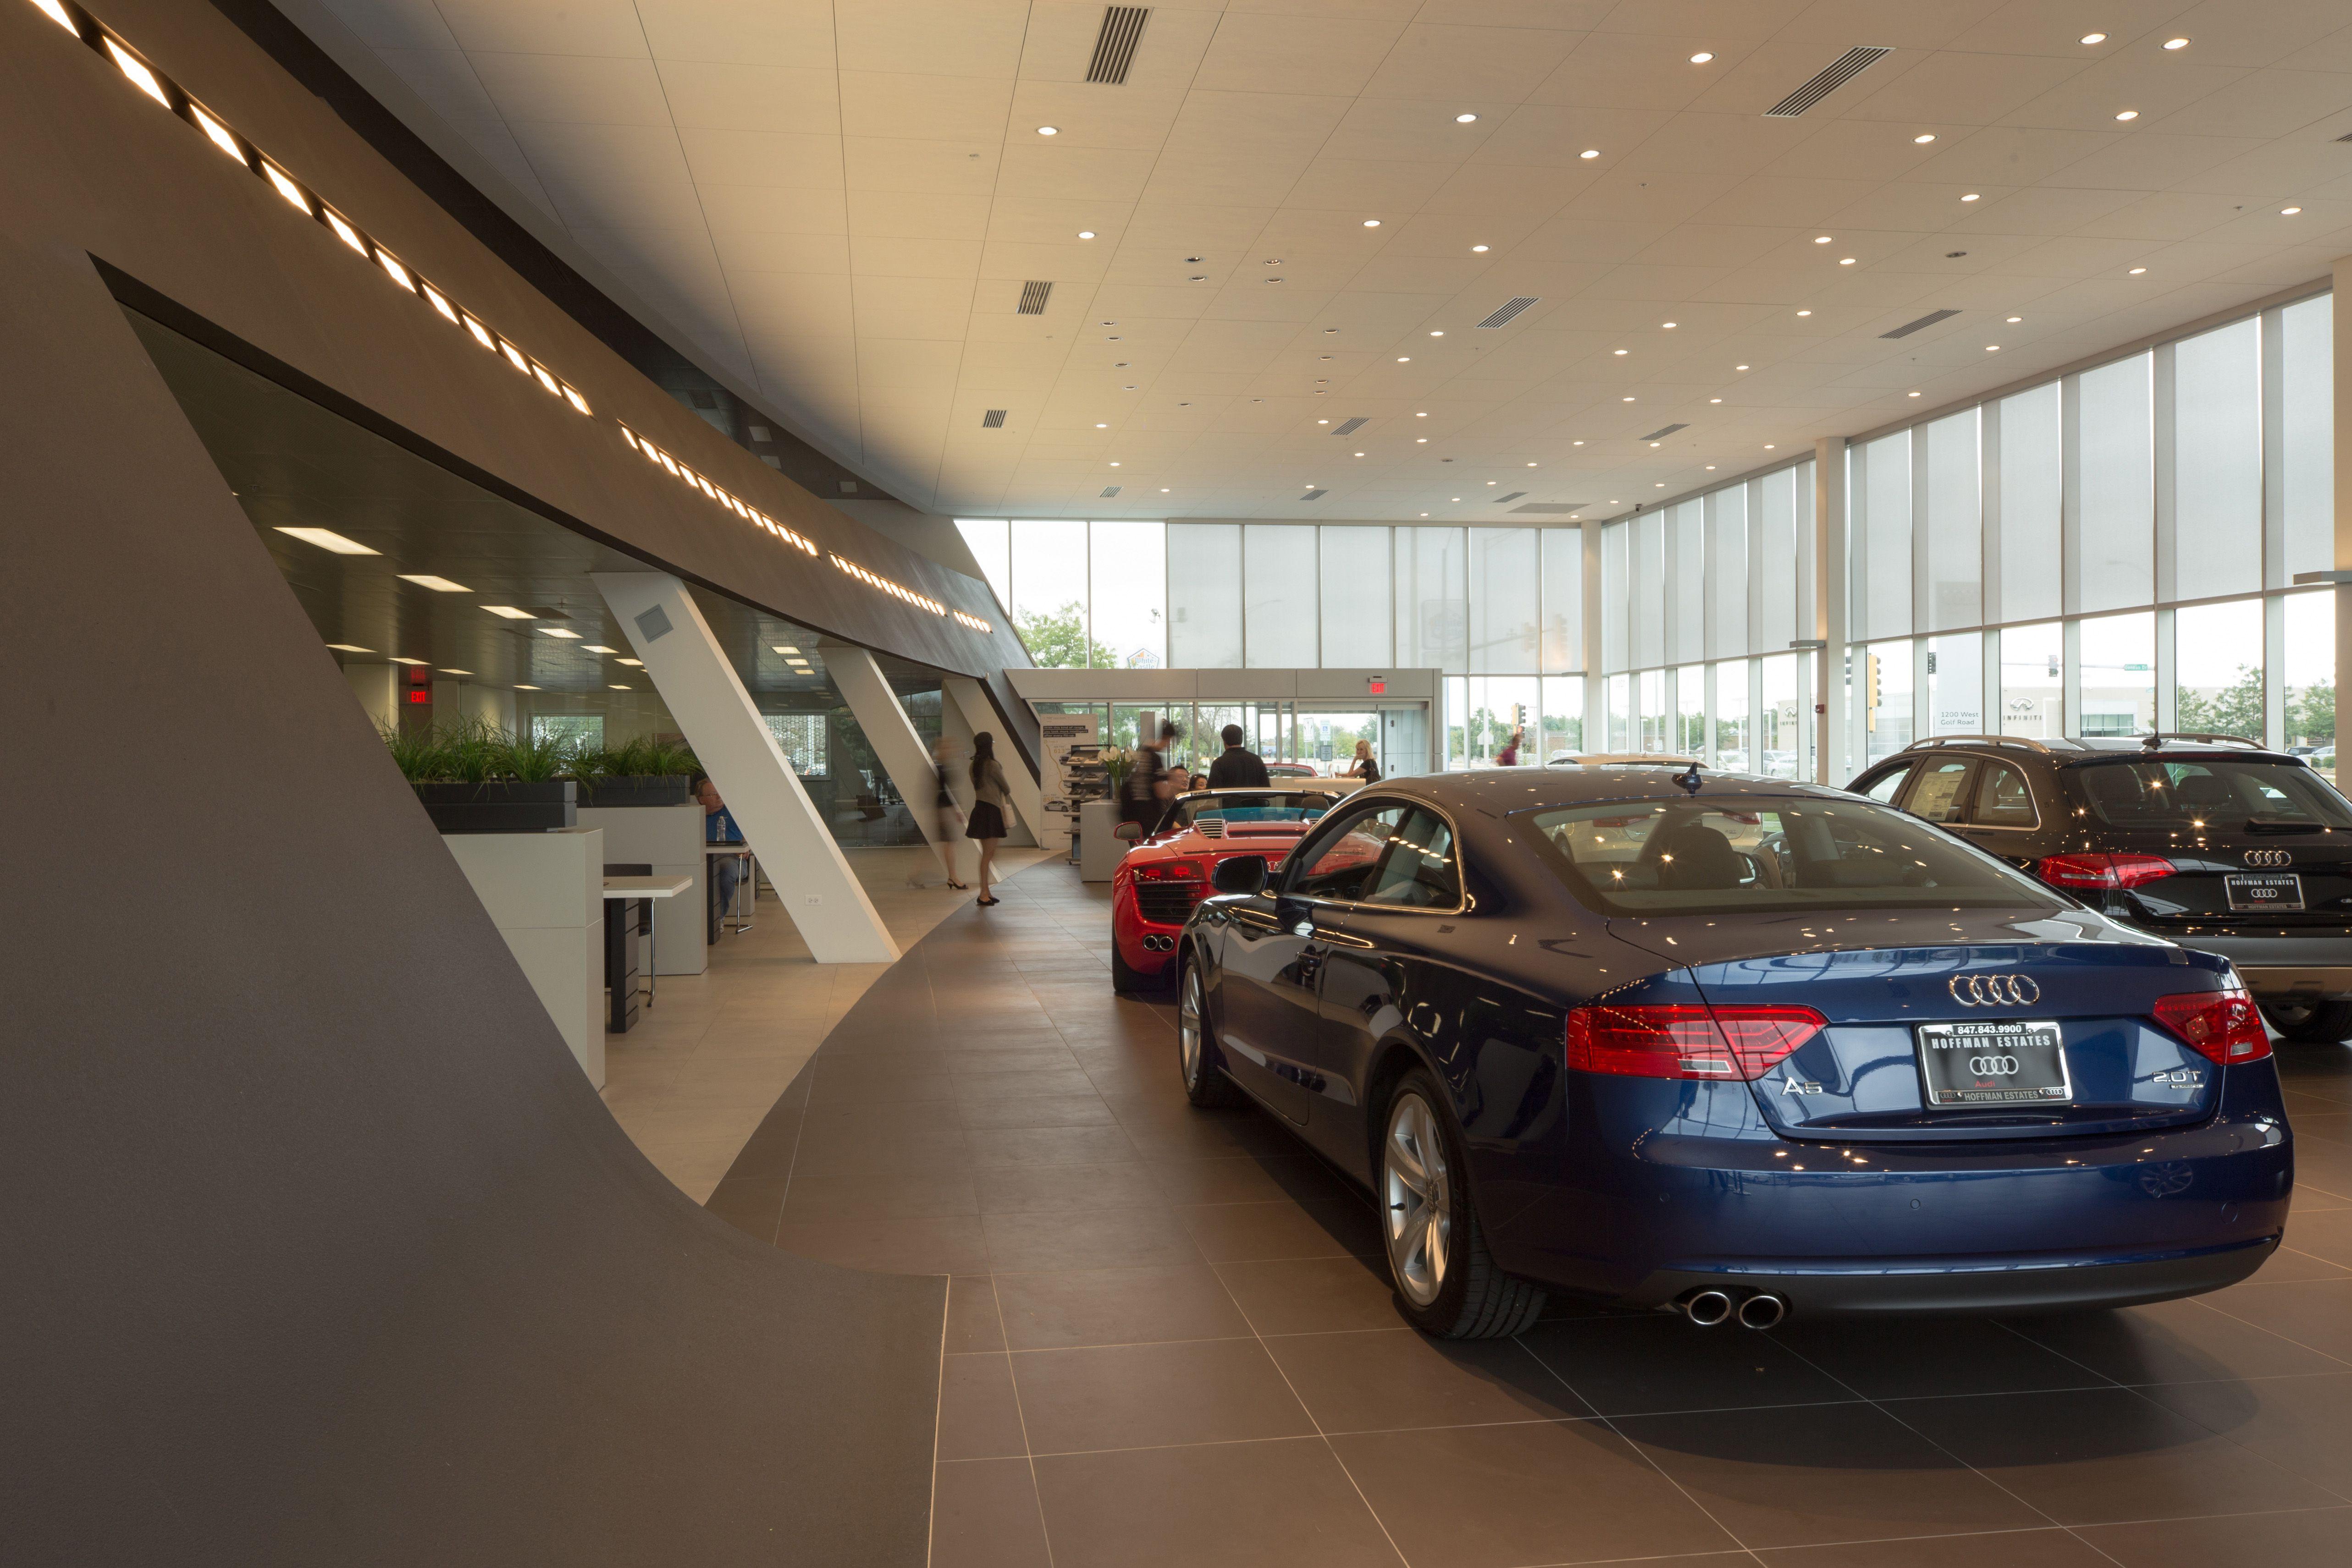 Audi Dealership Hoffman Estates Illinois Audi Car Dealership - Audi dealers in illinois